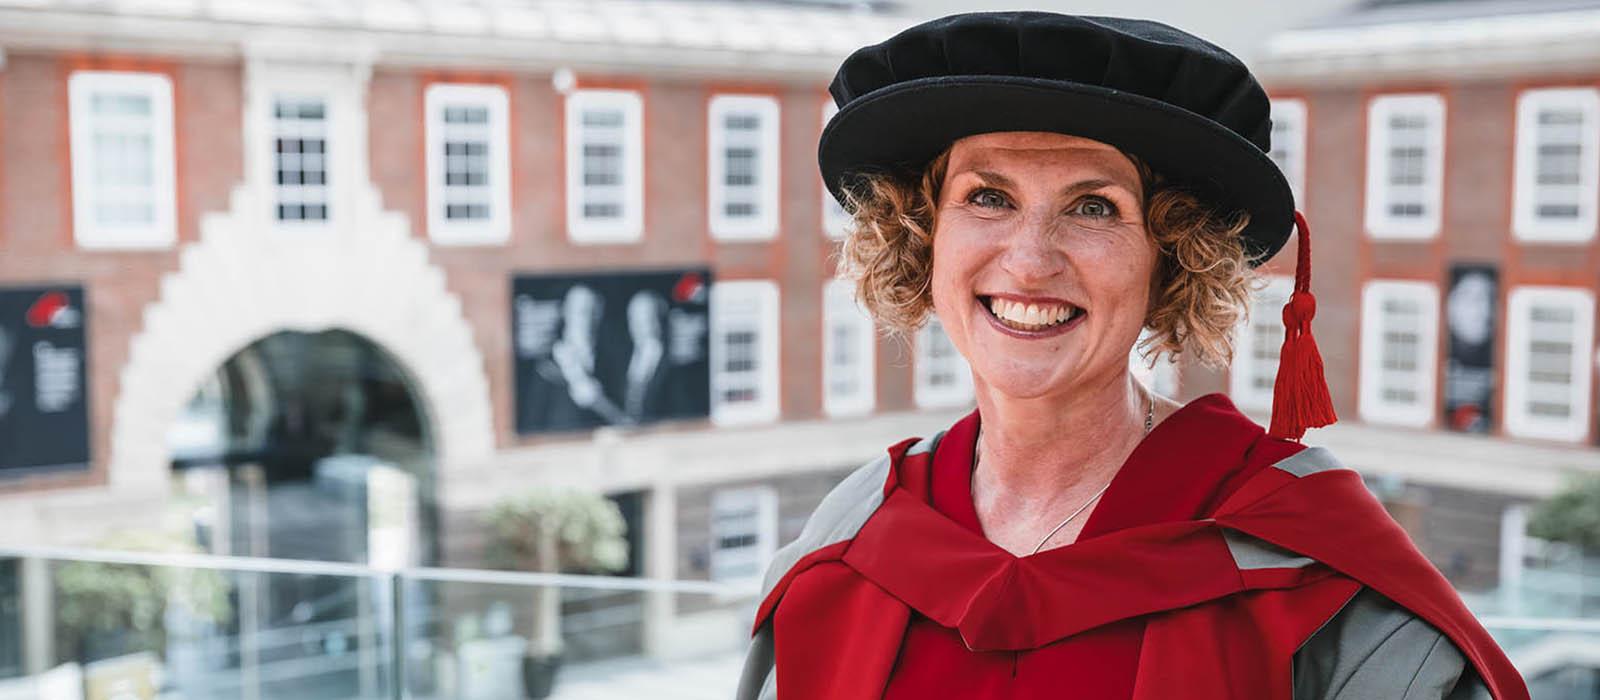 Maggie Appleton at Middlesex University